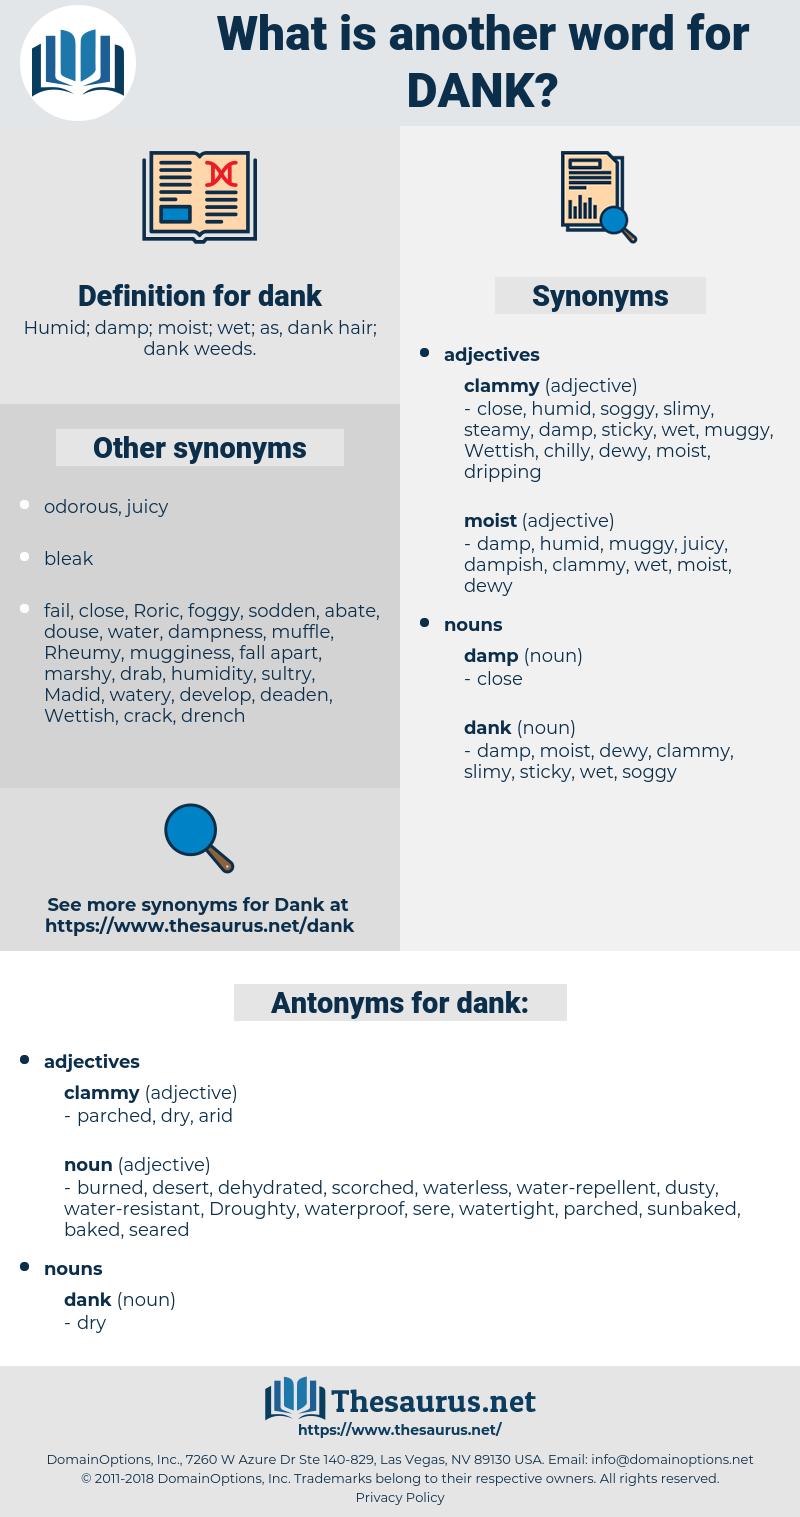 dank, synonym dank, another word for dank, words like dank, thesaurus dank